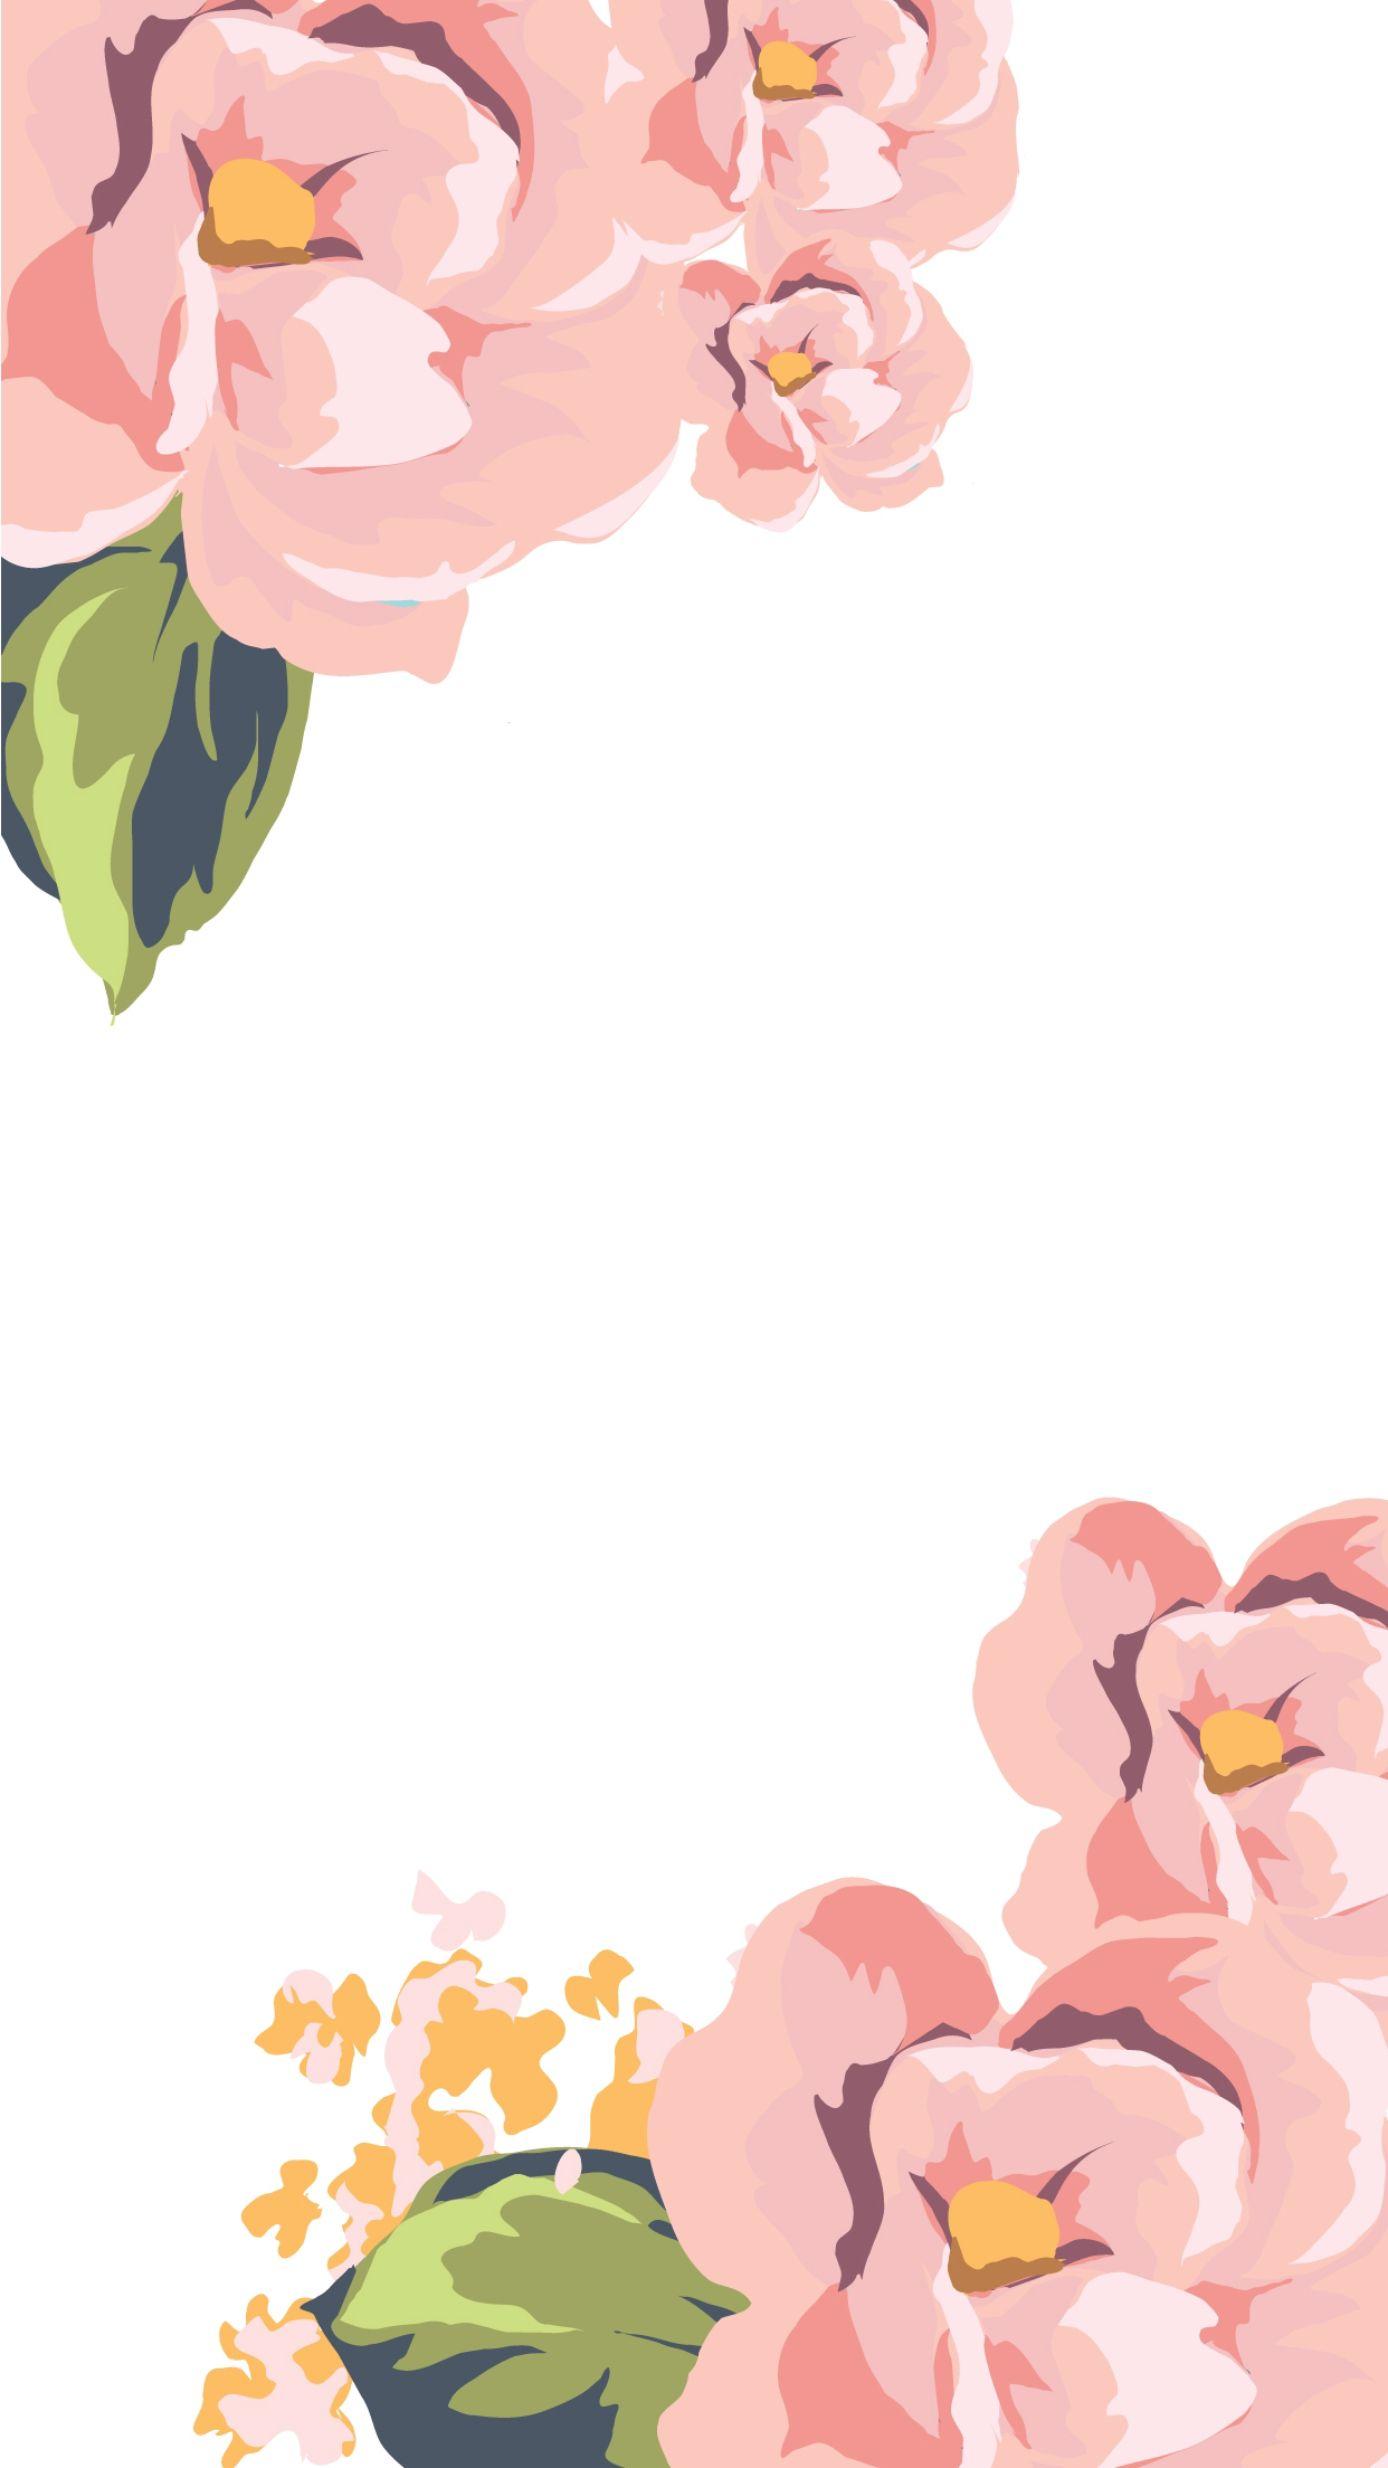 Wallpaper iPhone  Wallpaper backgrounds, Iphone wallpaper, Wallpaper